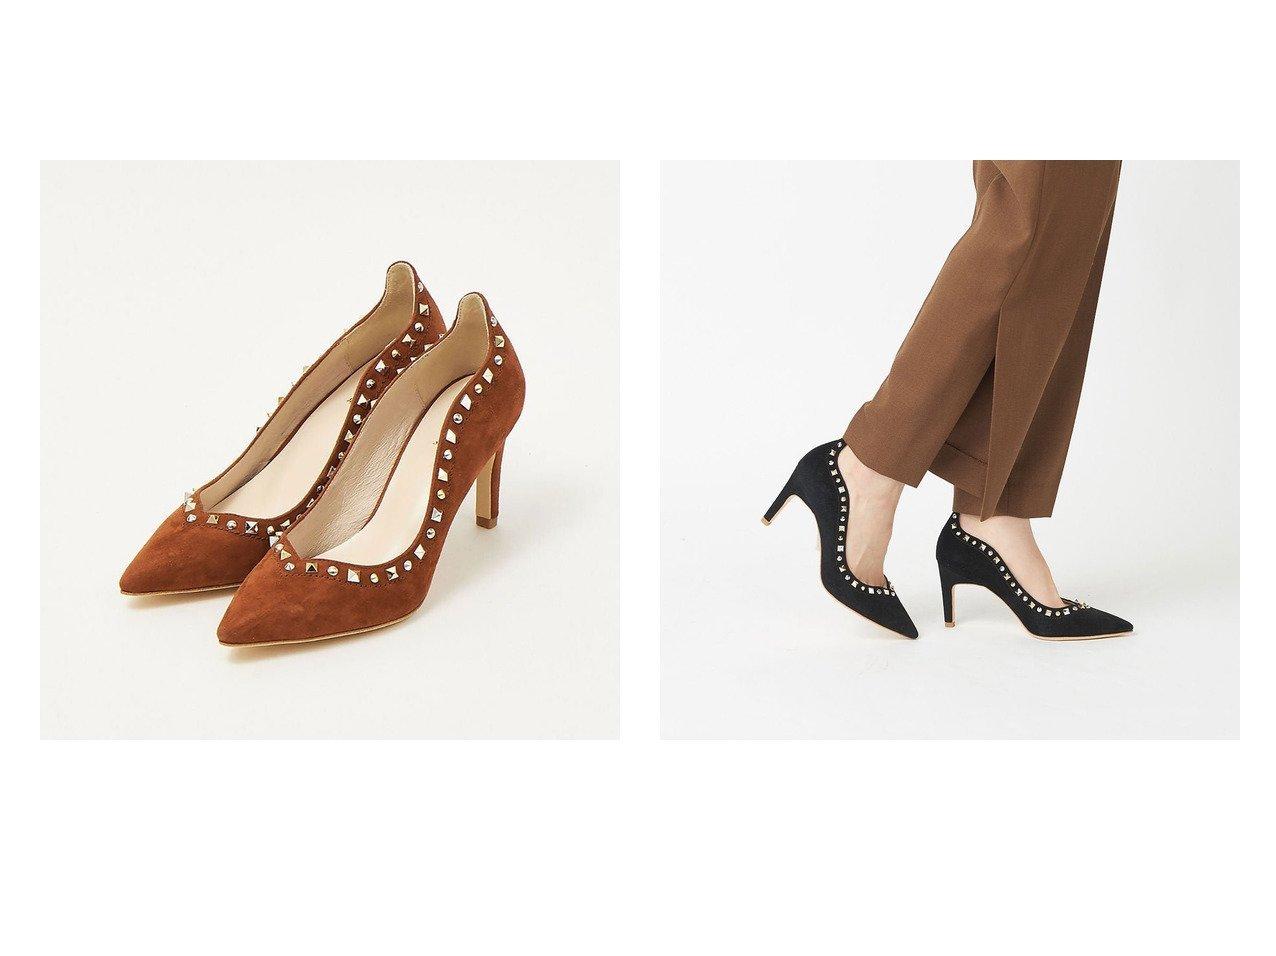 【Au BANNISTER/オゥ バニスター】のミックススタッズパンプス シューズ・靴のおすすめ!人気、トレンド・レディースファッションの通販 おすすめで人気の流行・トレンド、ファッションの通販商品 メンズファッション・キッズファッション・インテリア・家具・レディースファッション・服の通販 founy(ファニー) https://founy.com/ ファッション Fashion レディースファッション WOMEN  ID:crp329100000016108